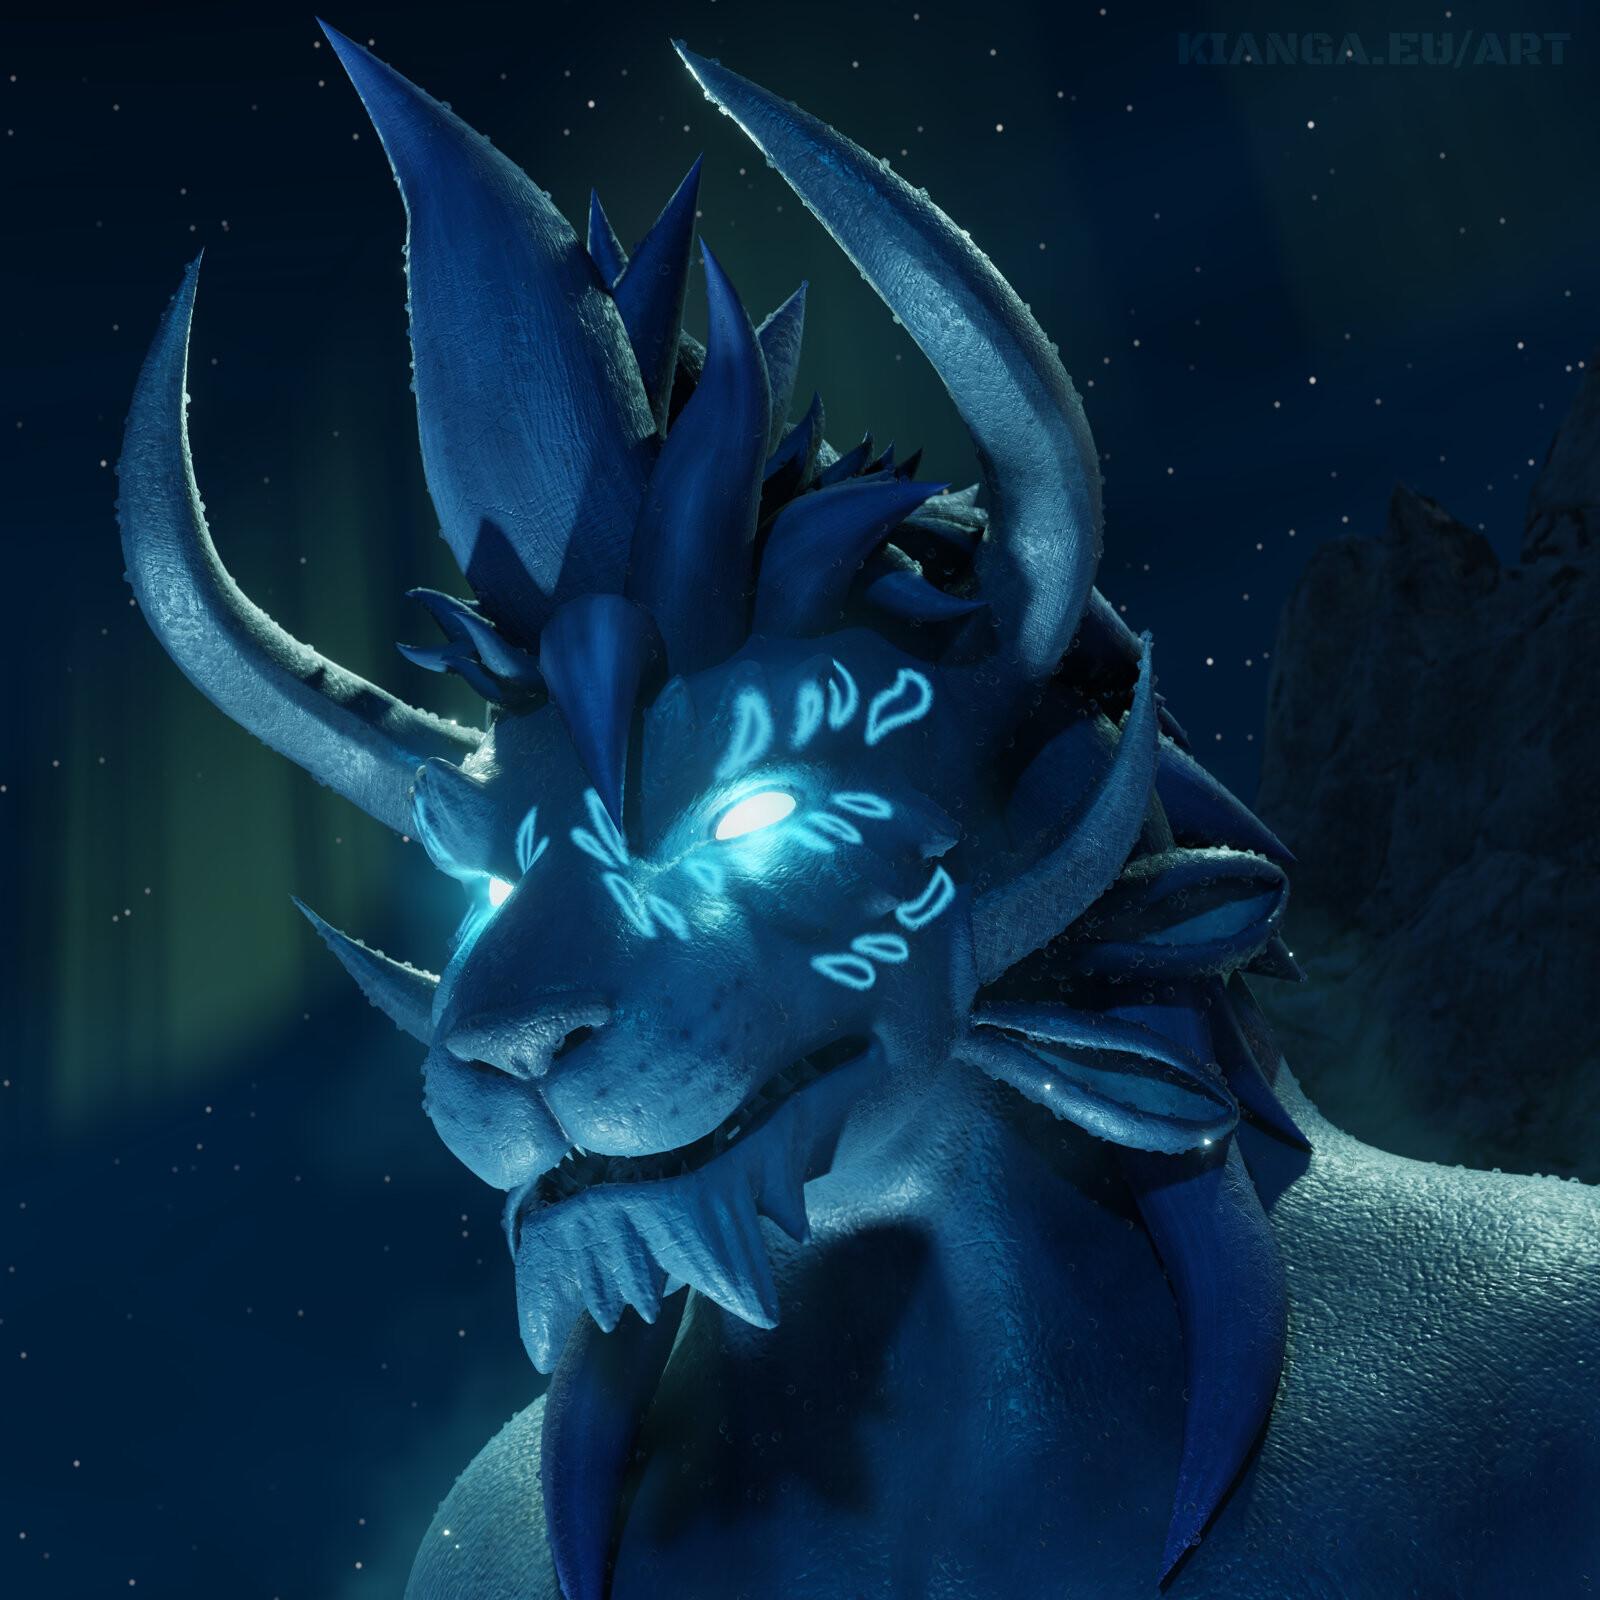 Frost Legion version